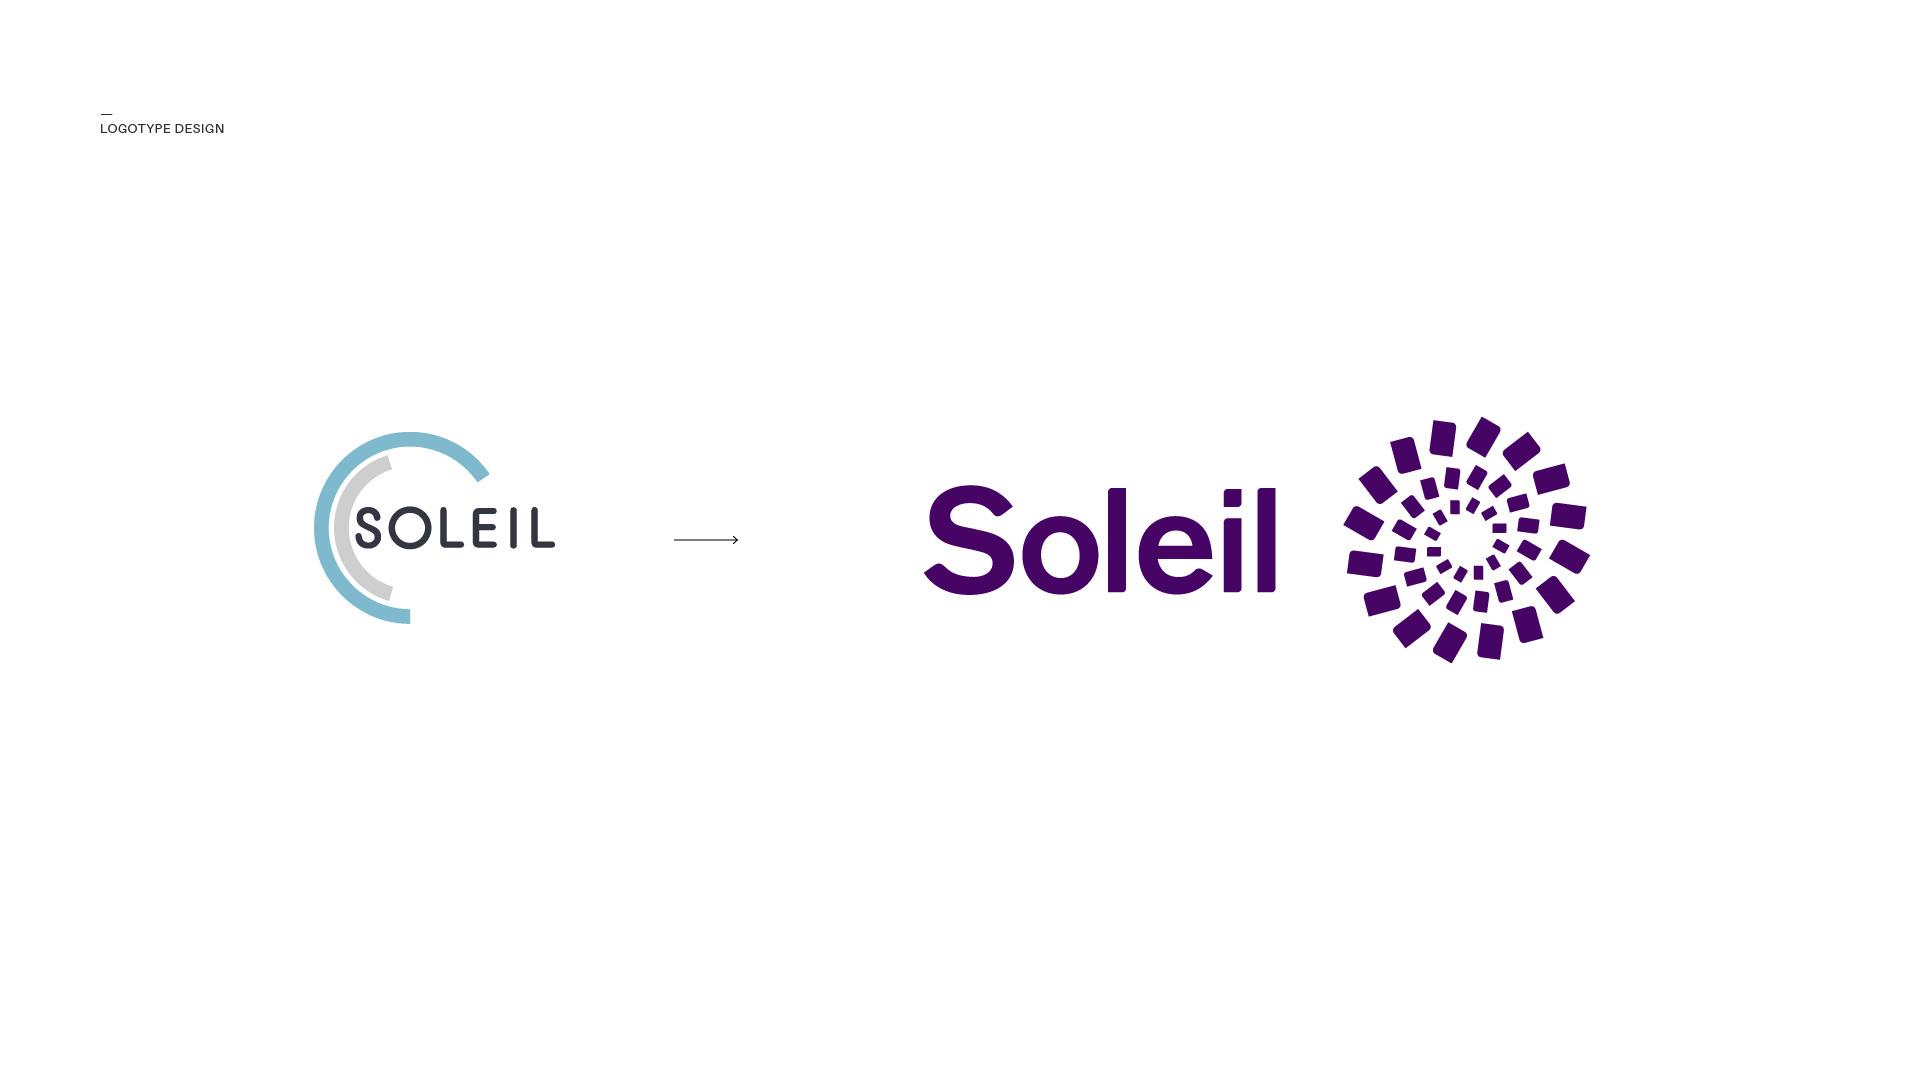 design-logotype-soleil-2